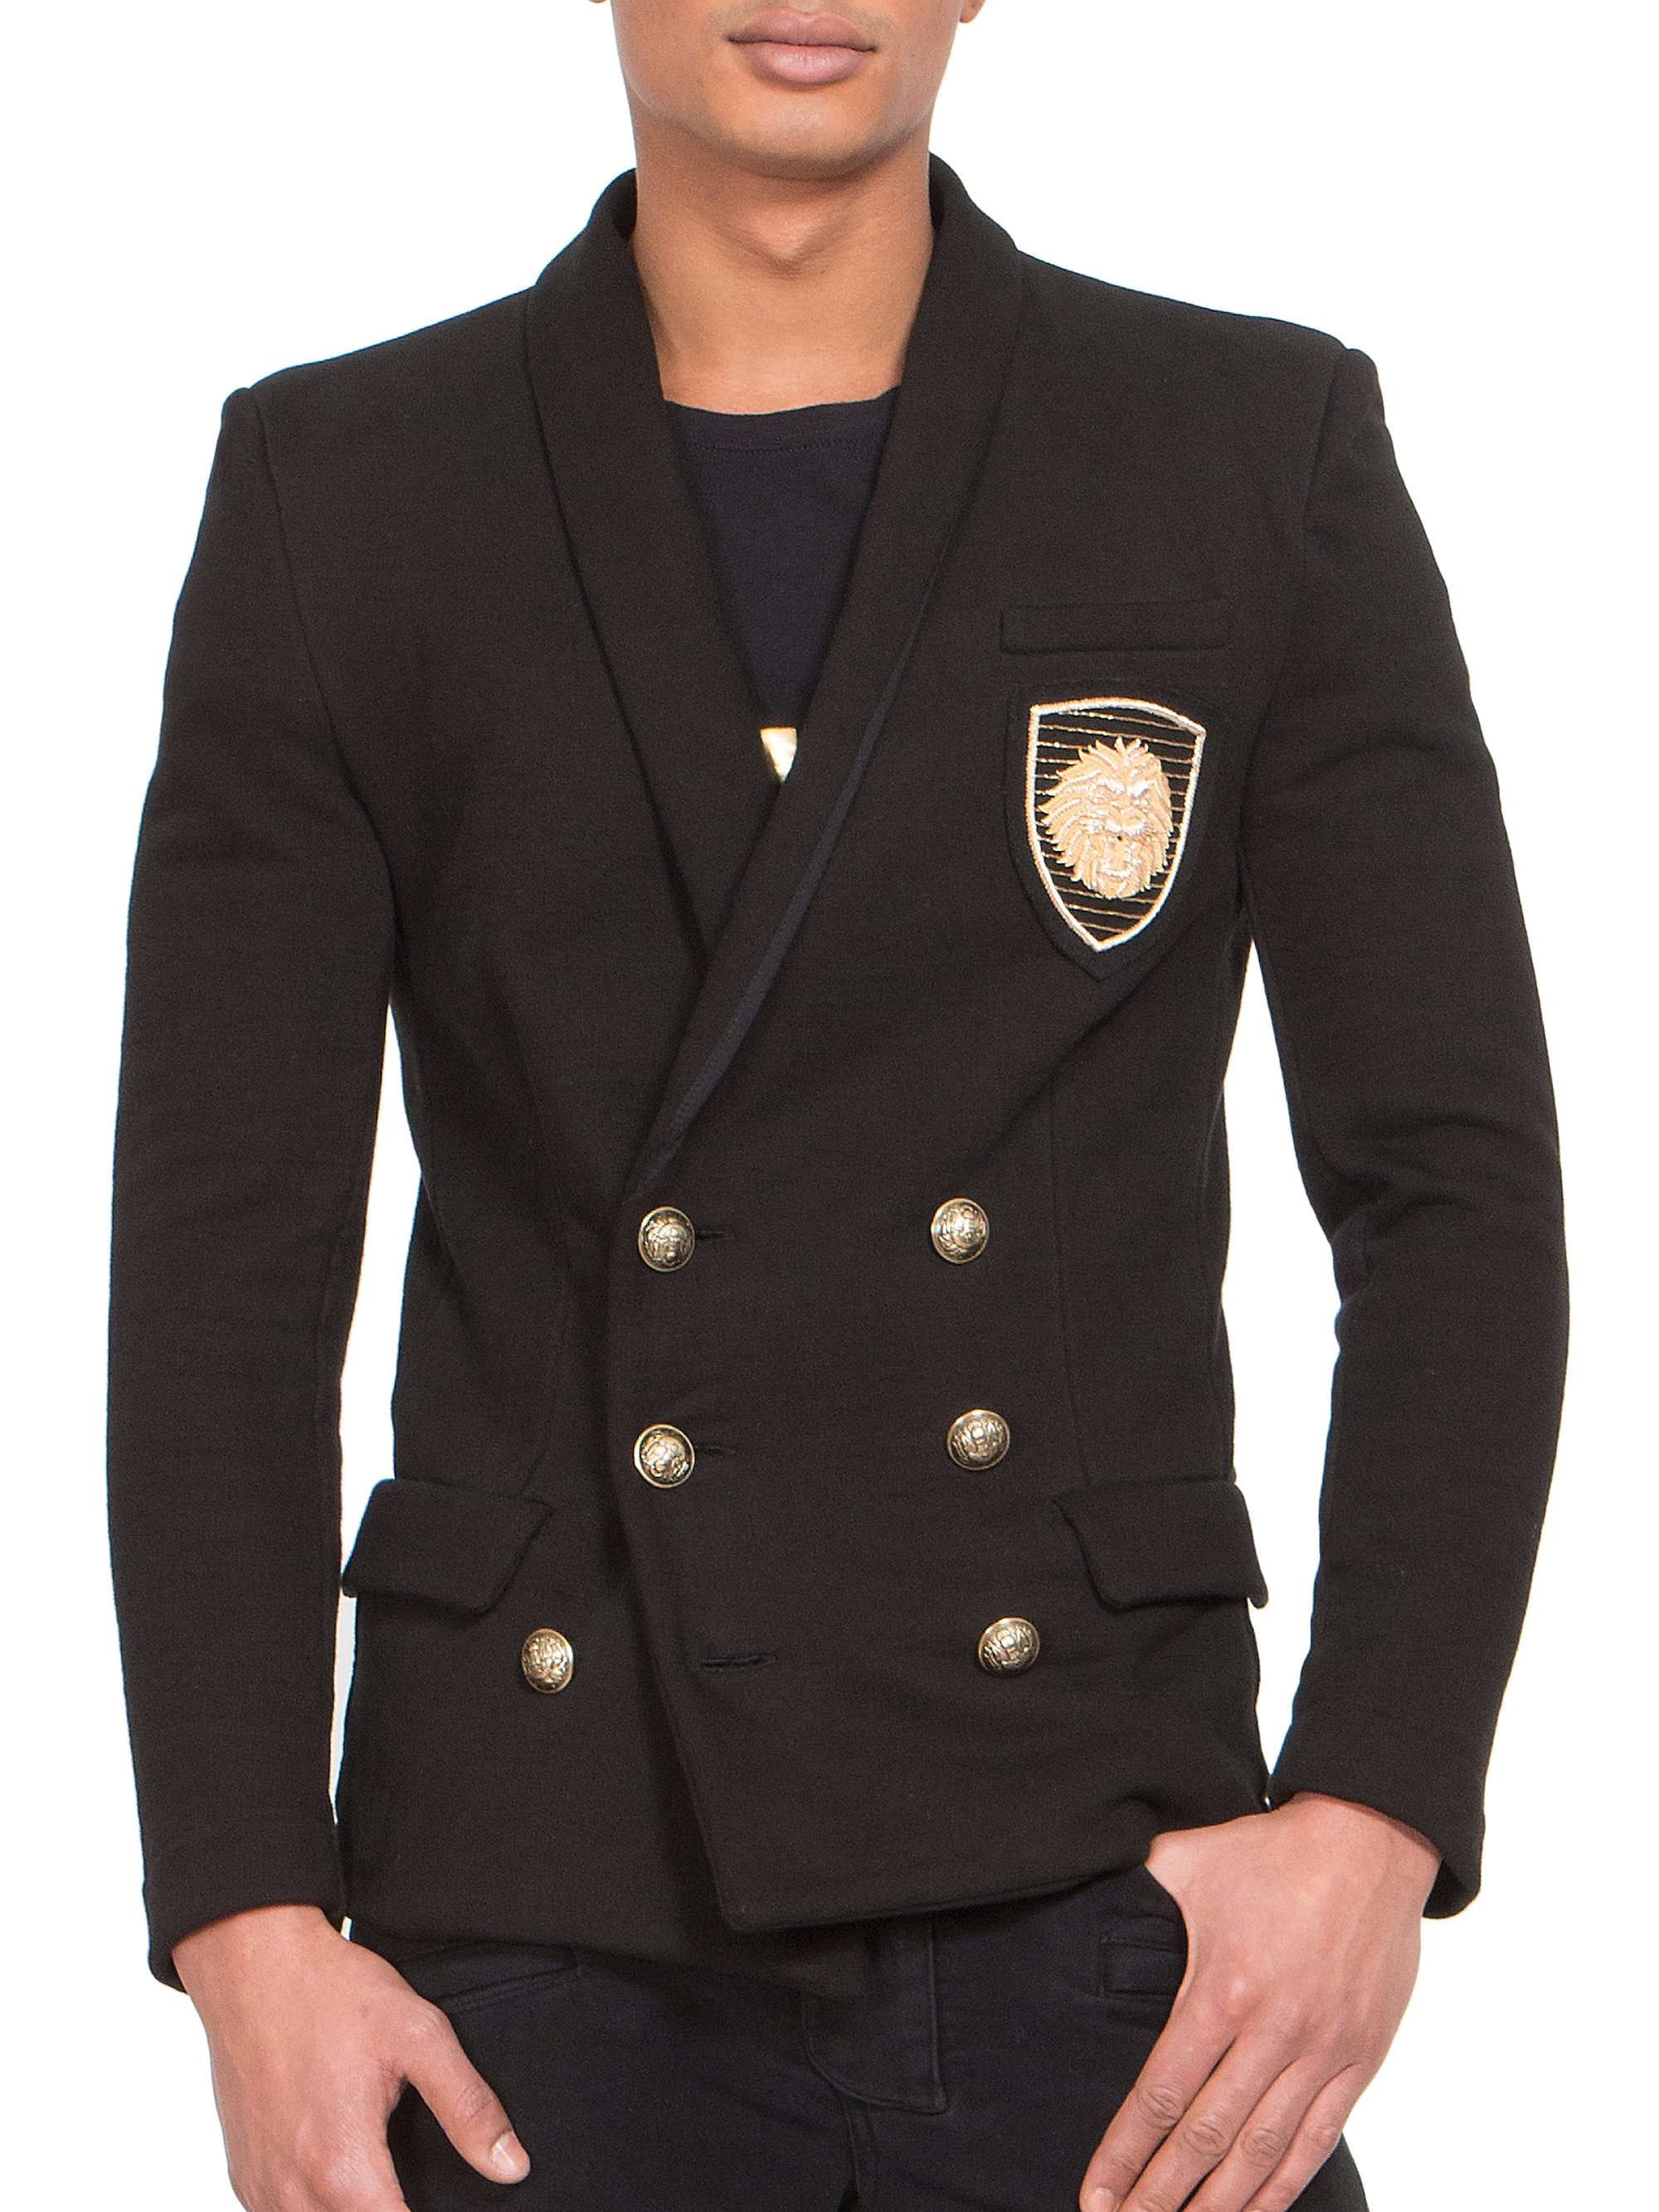 Balmain Dress Price | White Blazer Gold Buttons | Balmain Double Breasted Blazer